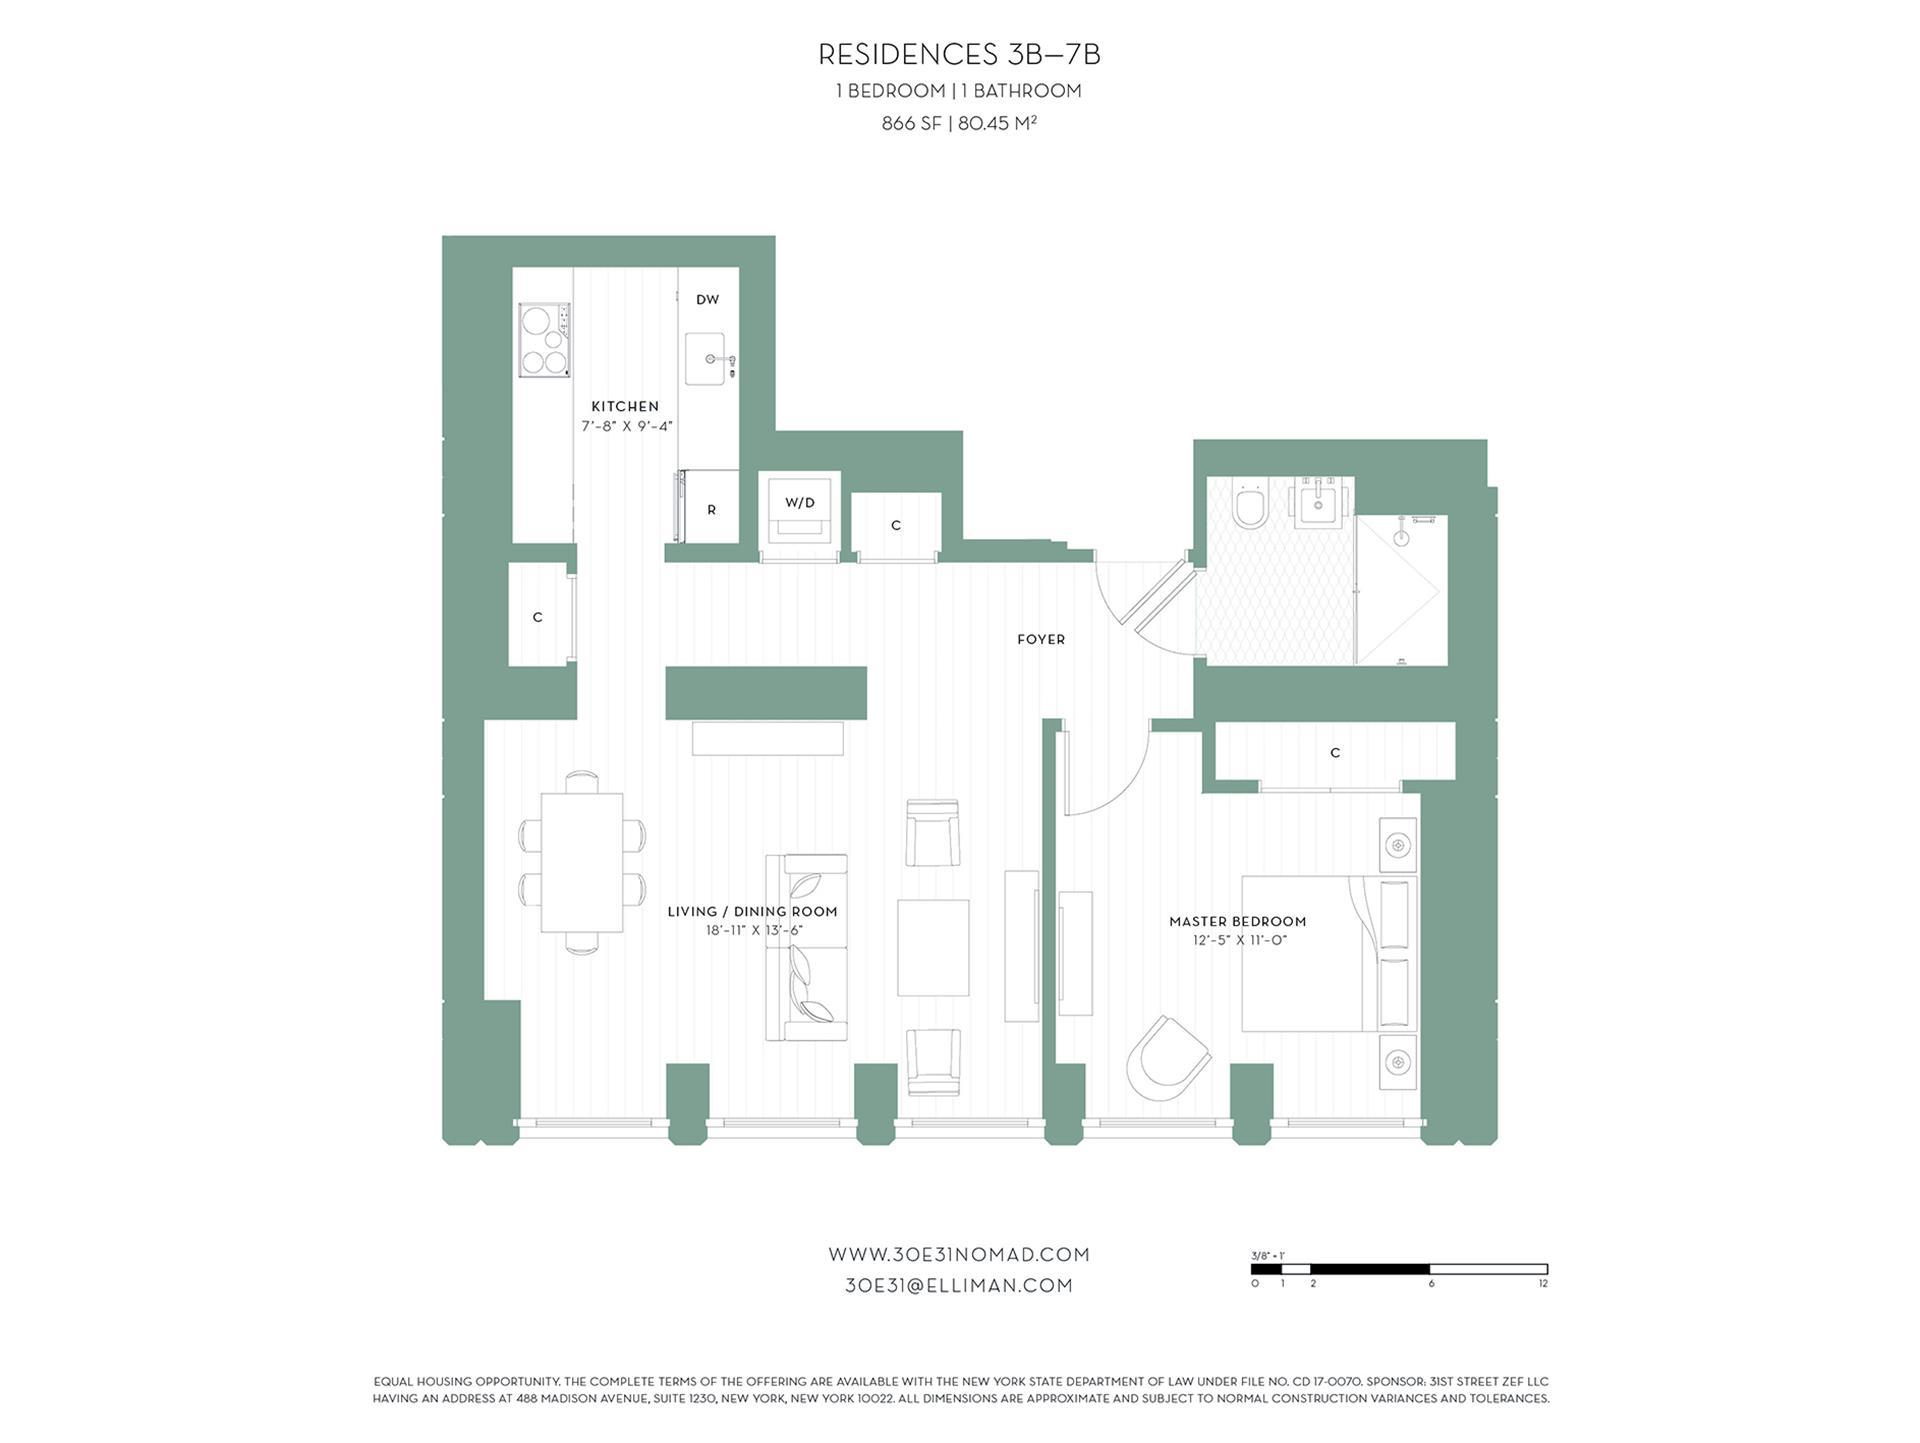 Floor plan of 30 East 31st St, 7B - Midtown, New York